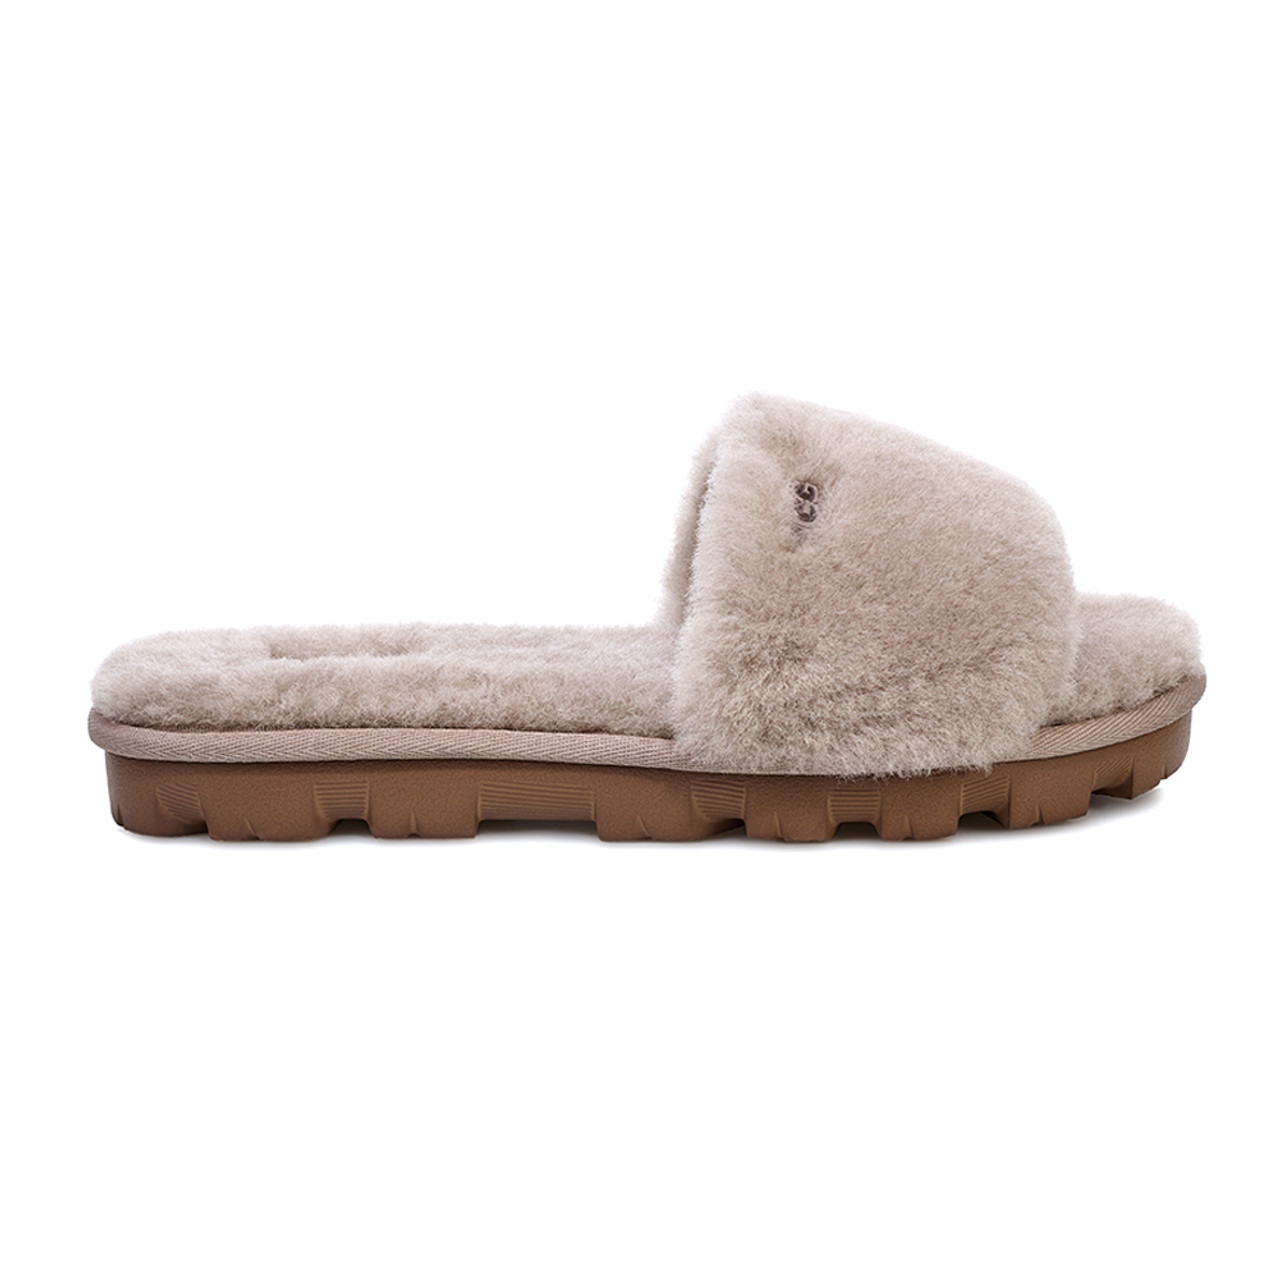 64df167ca8 UGG Women's Cozette Slide Slipper - Grey | Discount Ugg Ladie's ...